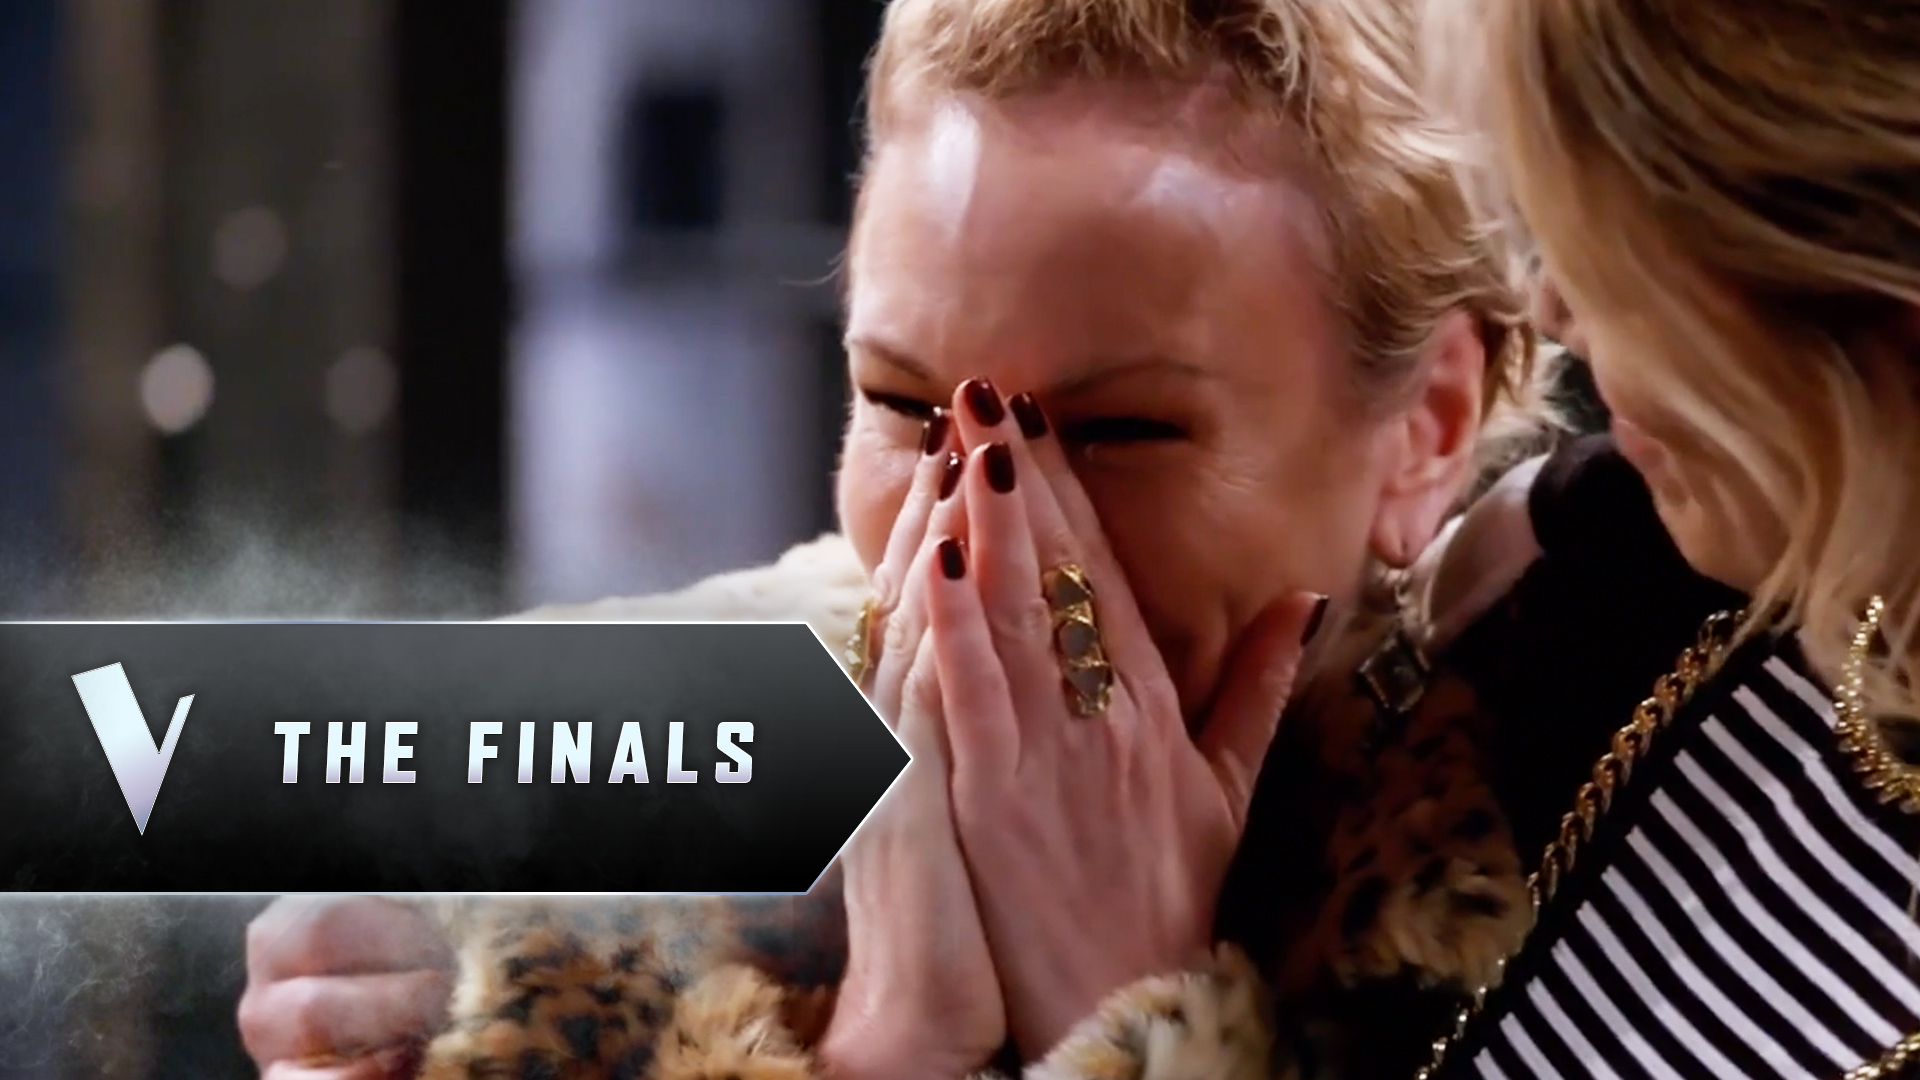 Delta surprises Natasha with an emotional reunion